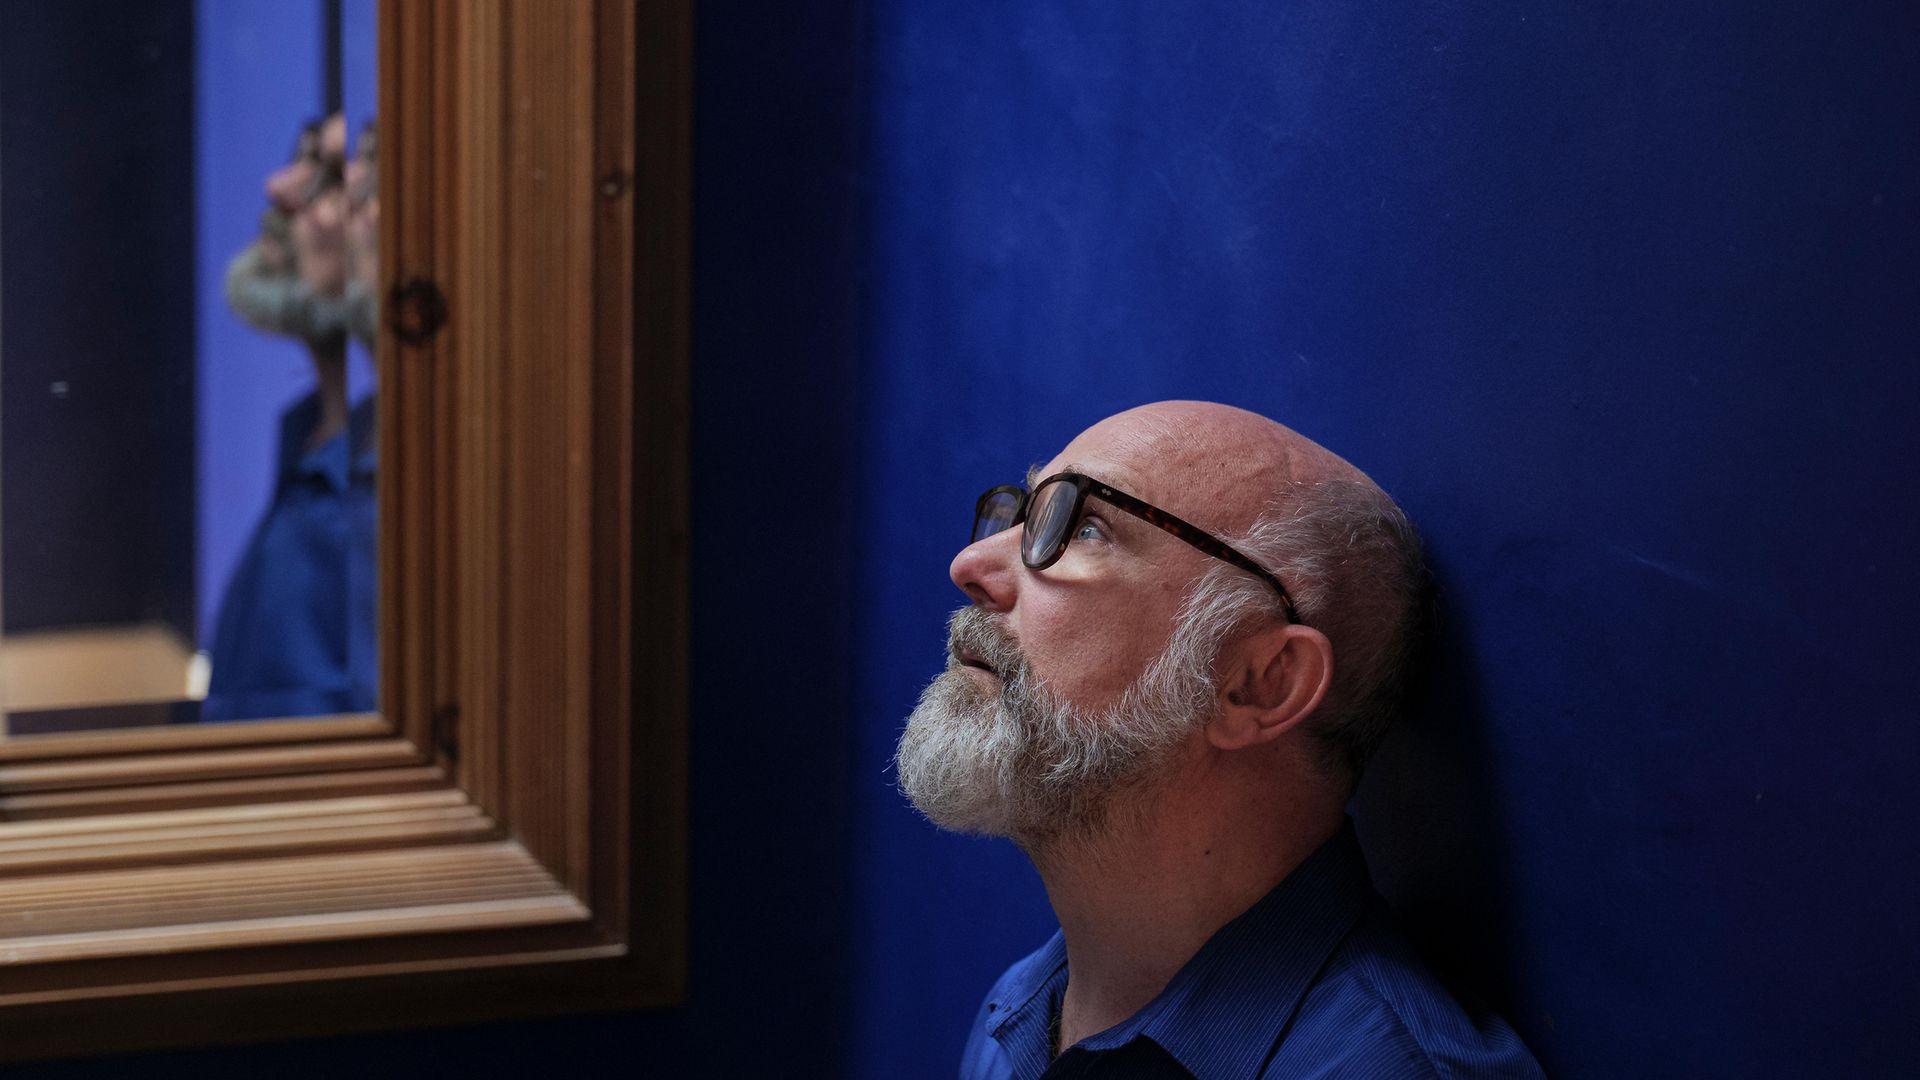 Stephen Unwin (theatre and opera director, writer and teacher) at home - Credit: Edmond Terakopian